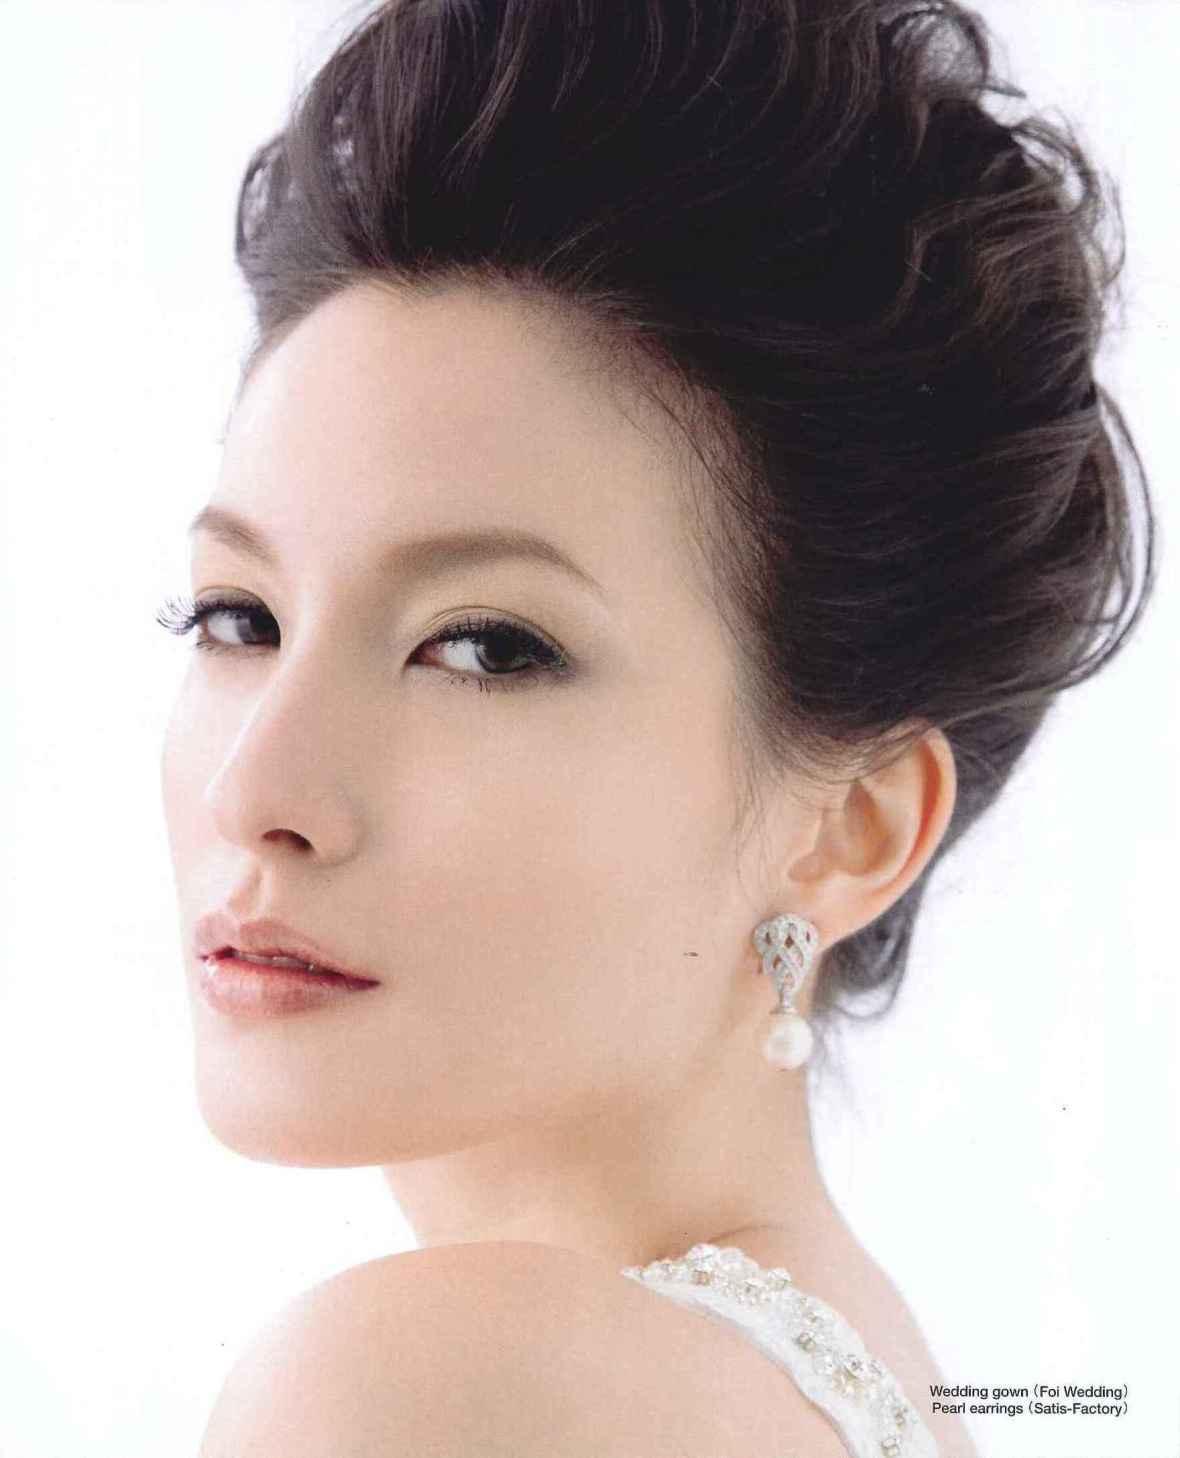 Natacha Meunier_MSI Modeling Agency in Bangkok Thailand_By Miss Josie Sang (75)